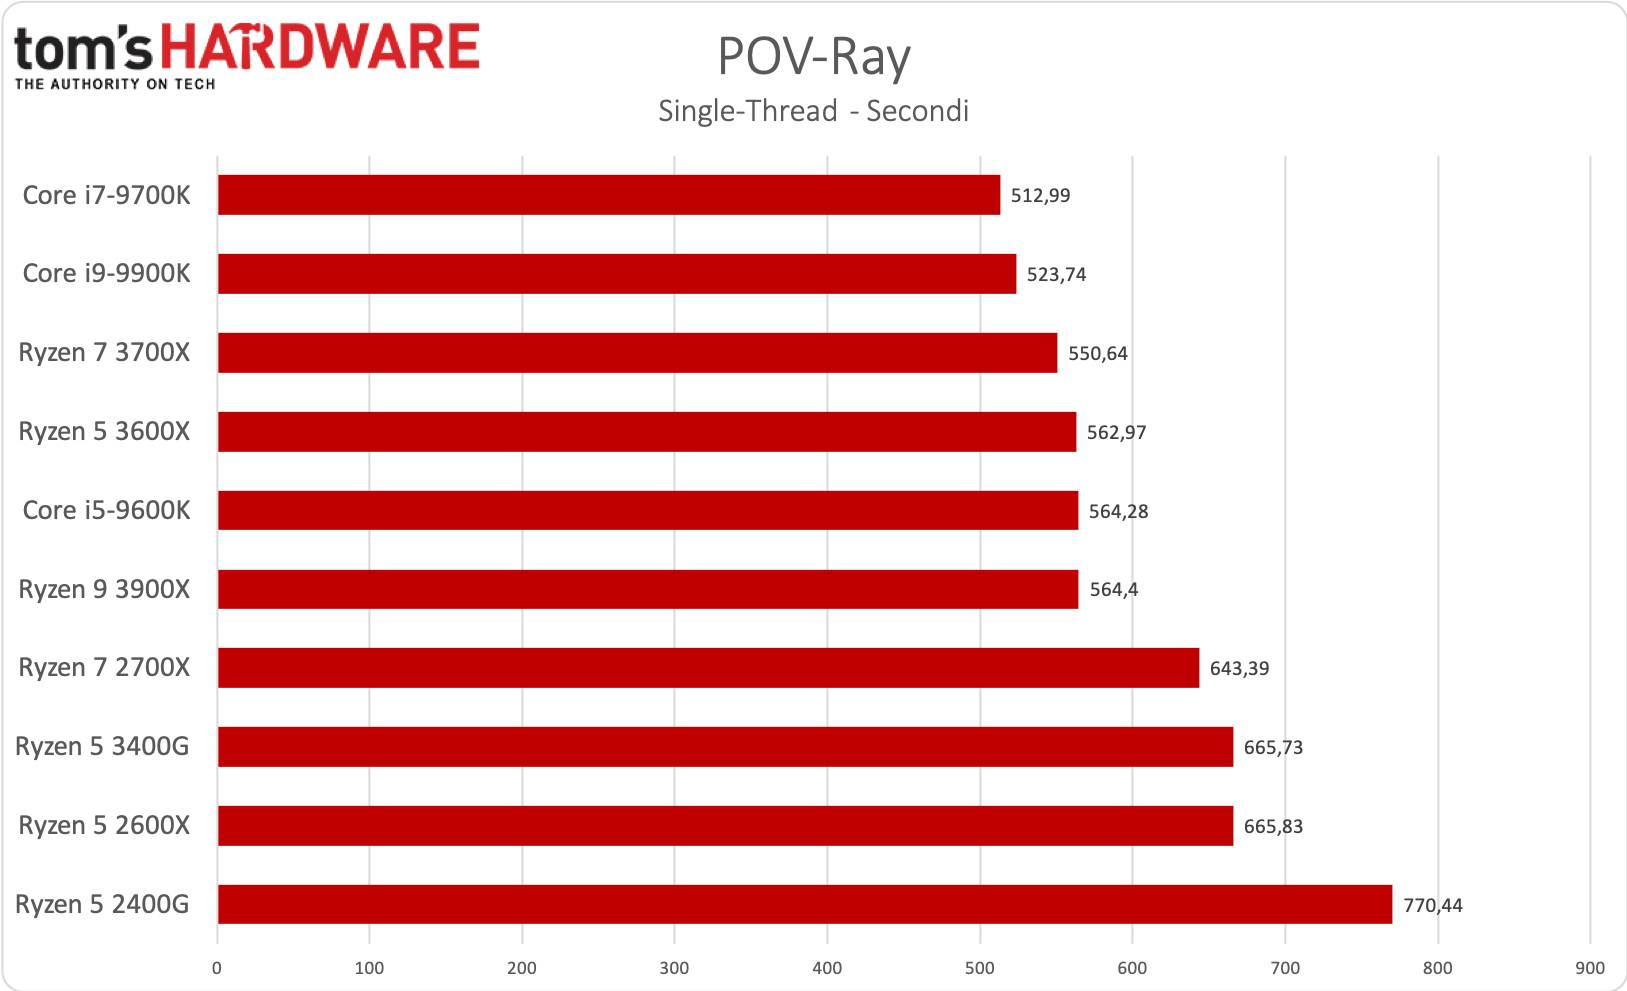 Ryzen 5 3400G - POV-Ray single-thread